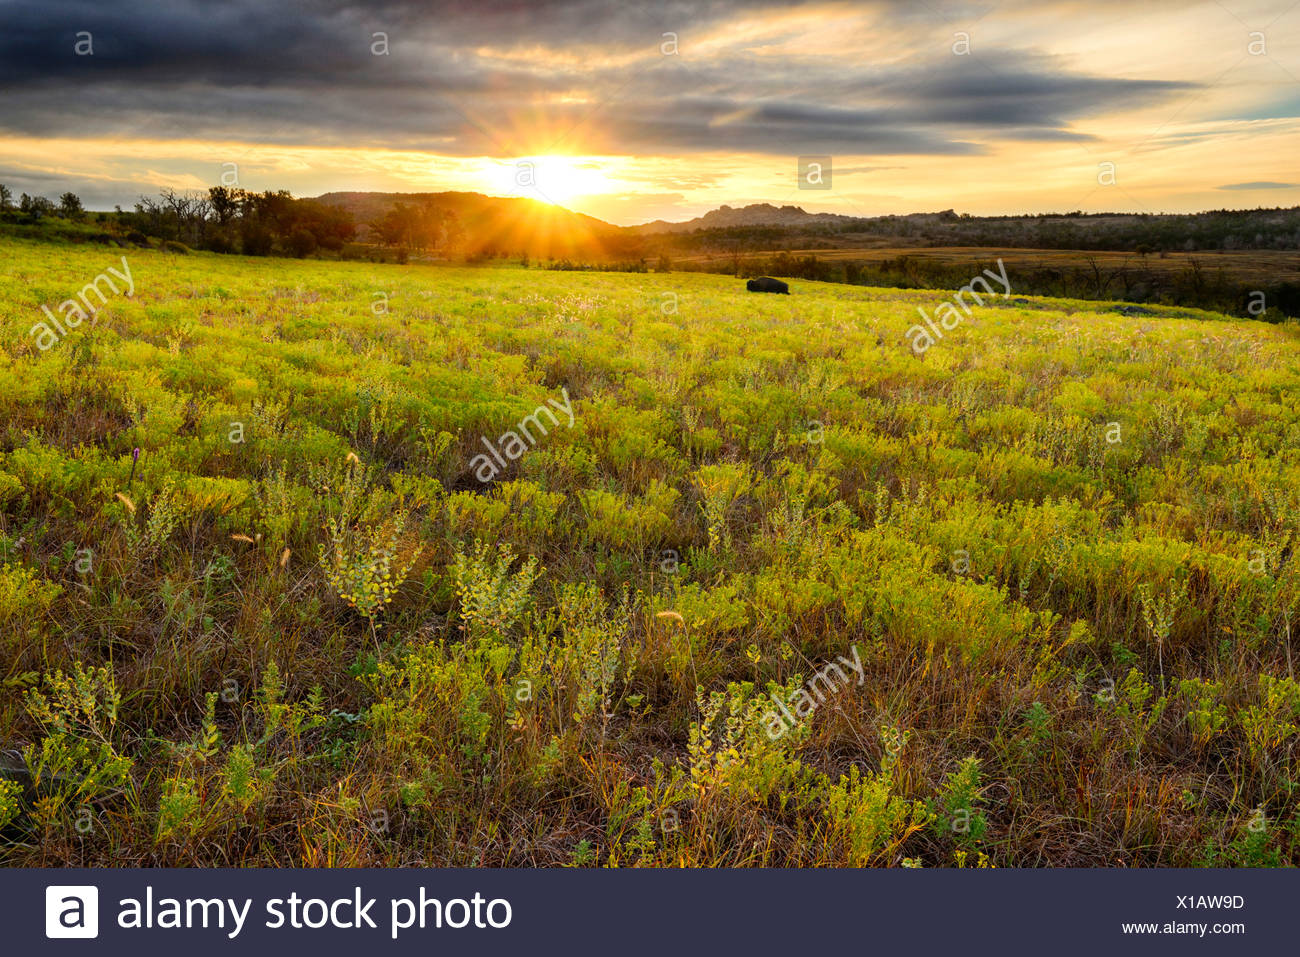 USA, United States, America, North America, Oklahoma, Comanche, Wichita, mountains, refuge, nature, landscape, grass, grassland, Stock Photo